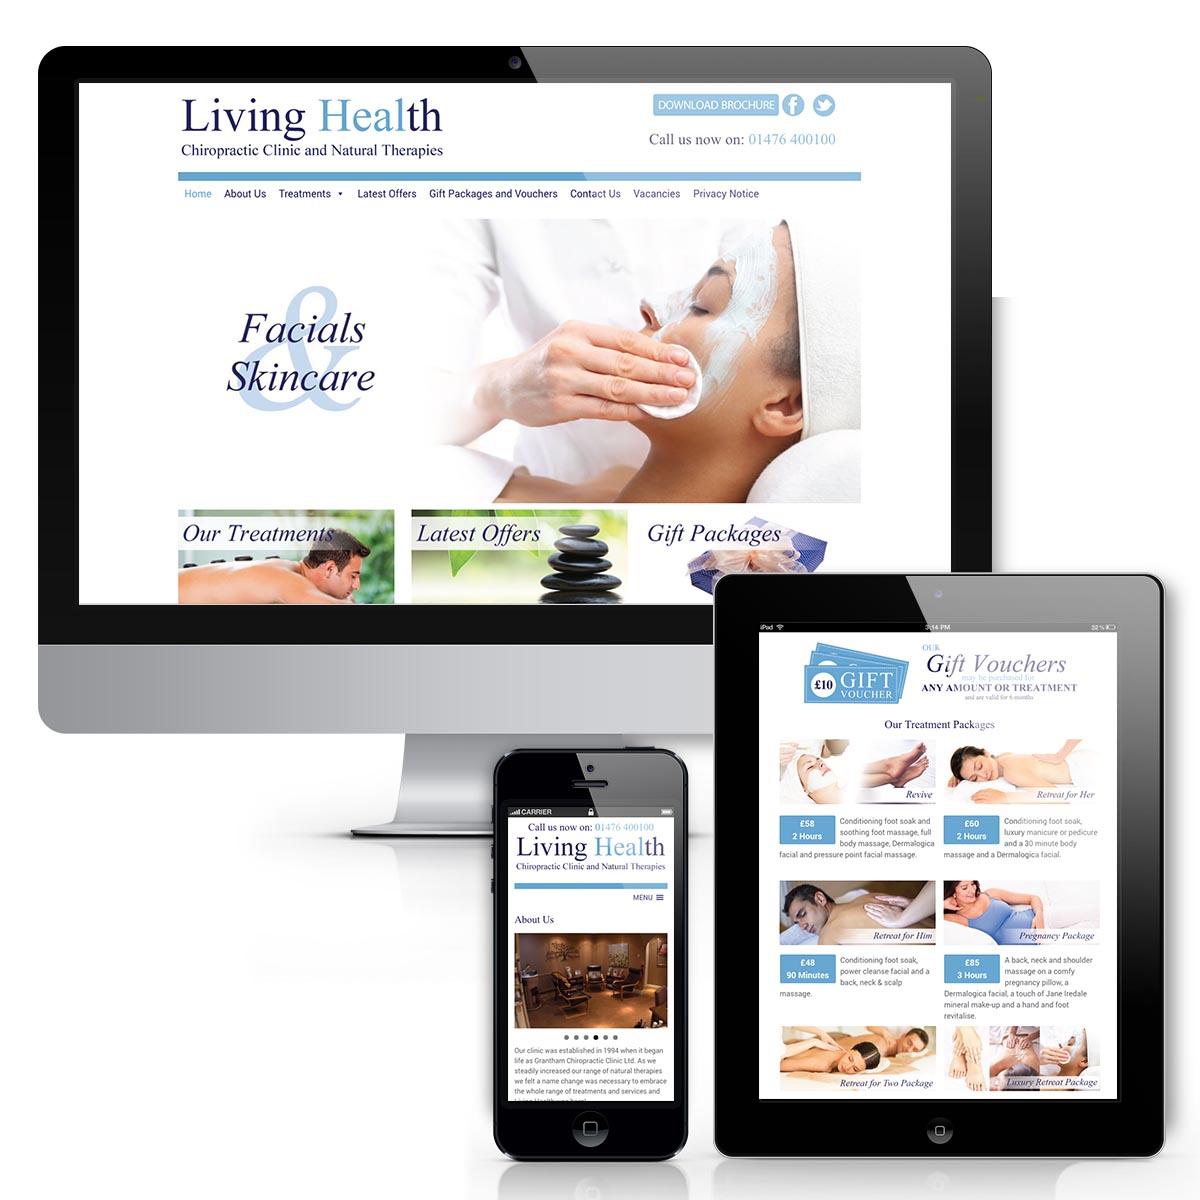 Living Health Website design